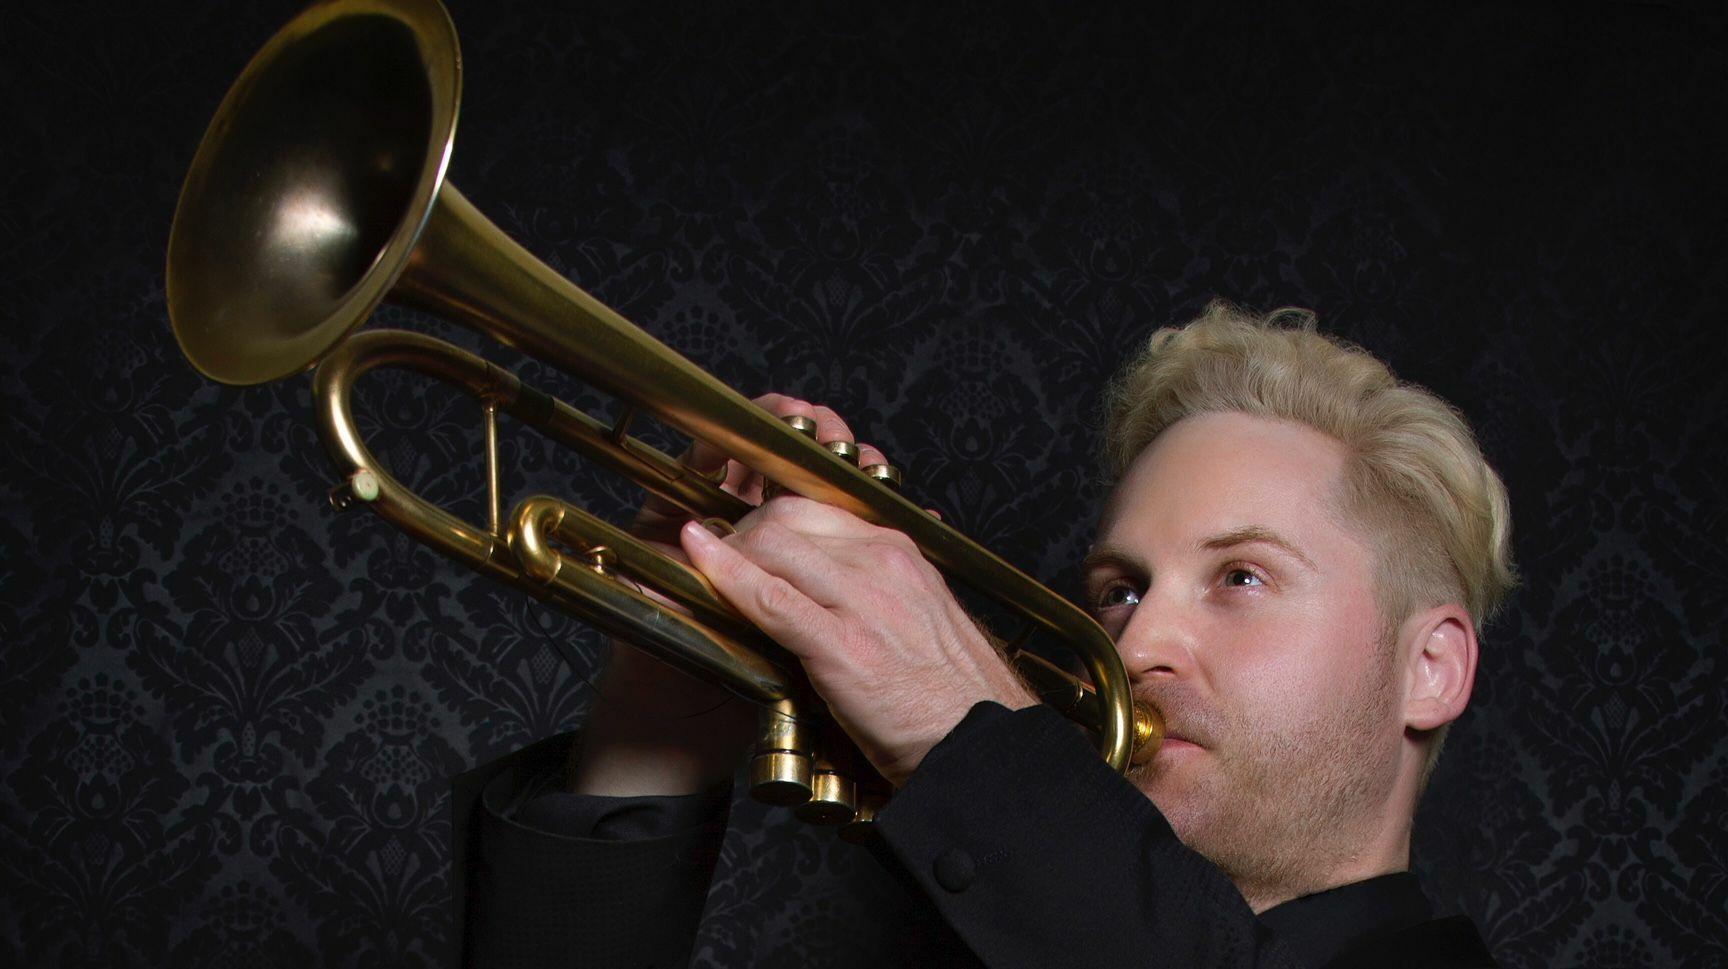 Virtual Worldwide LIVE! Award-winning Jazz Artist MATT VON RODERICK